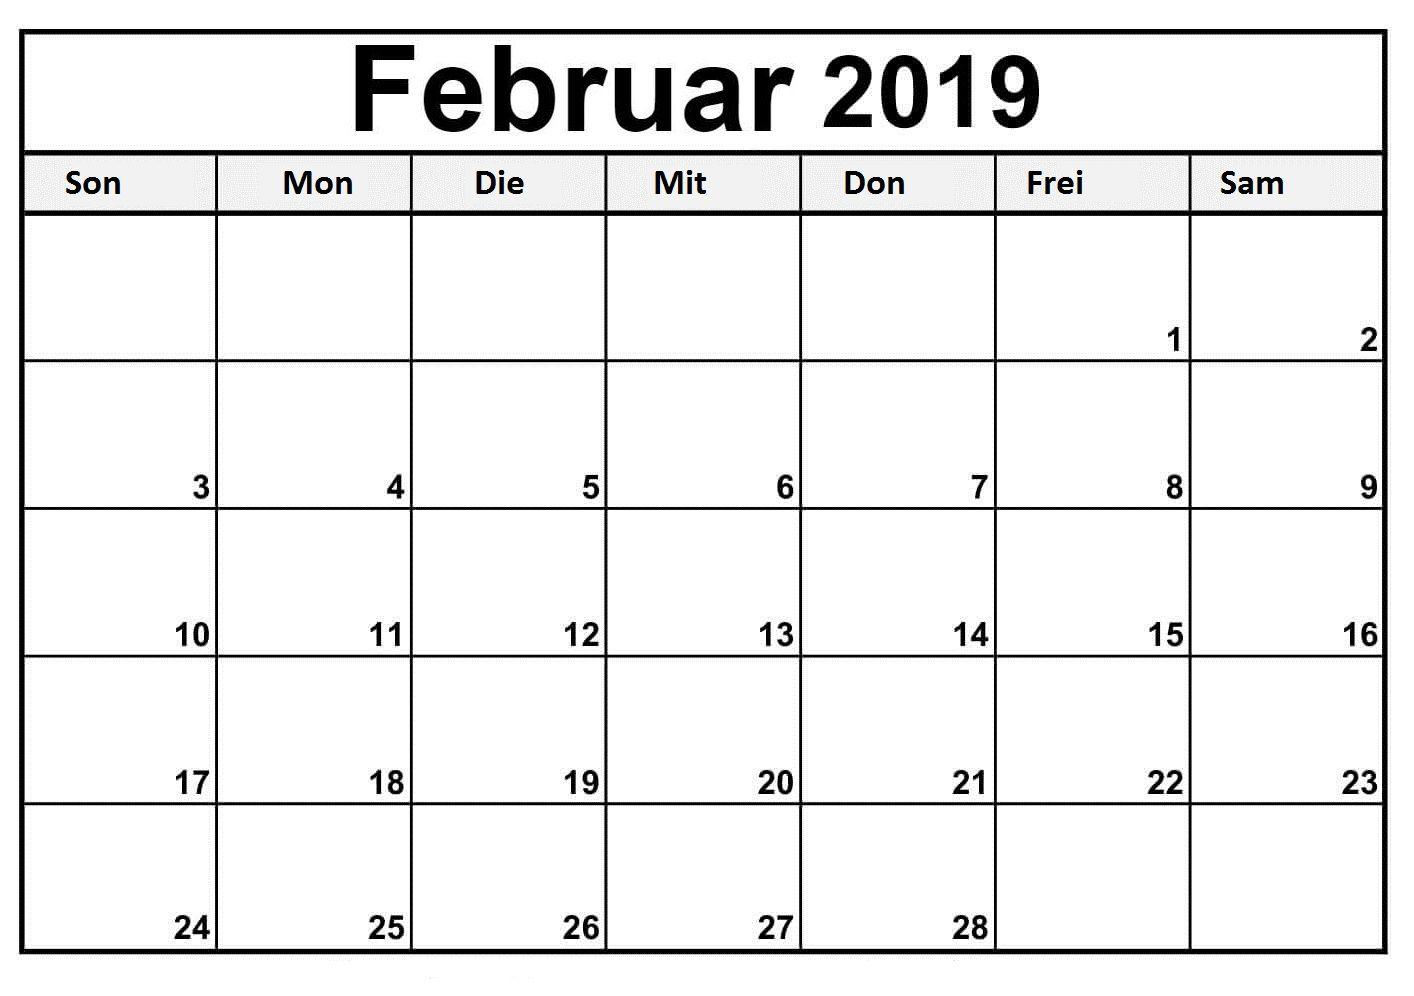 kalender februar malvorlage  coloring and malvorlagan